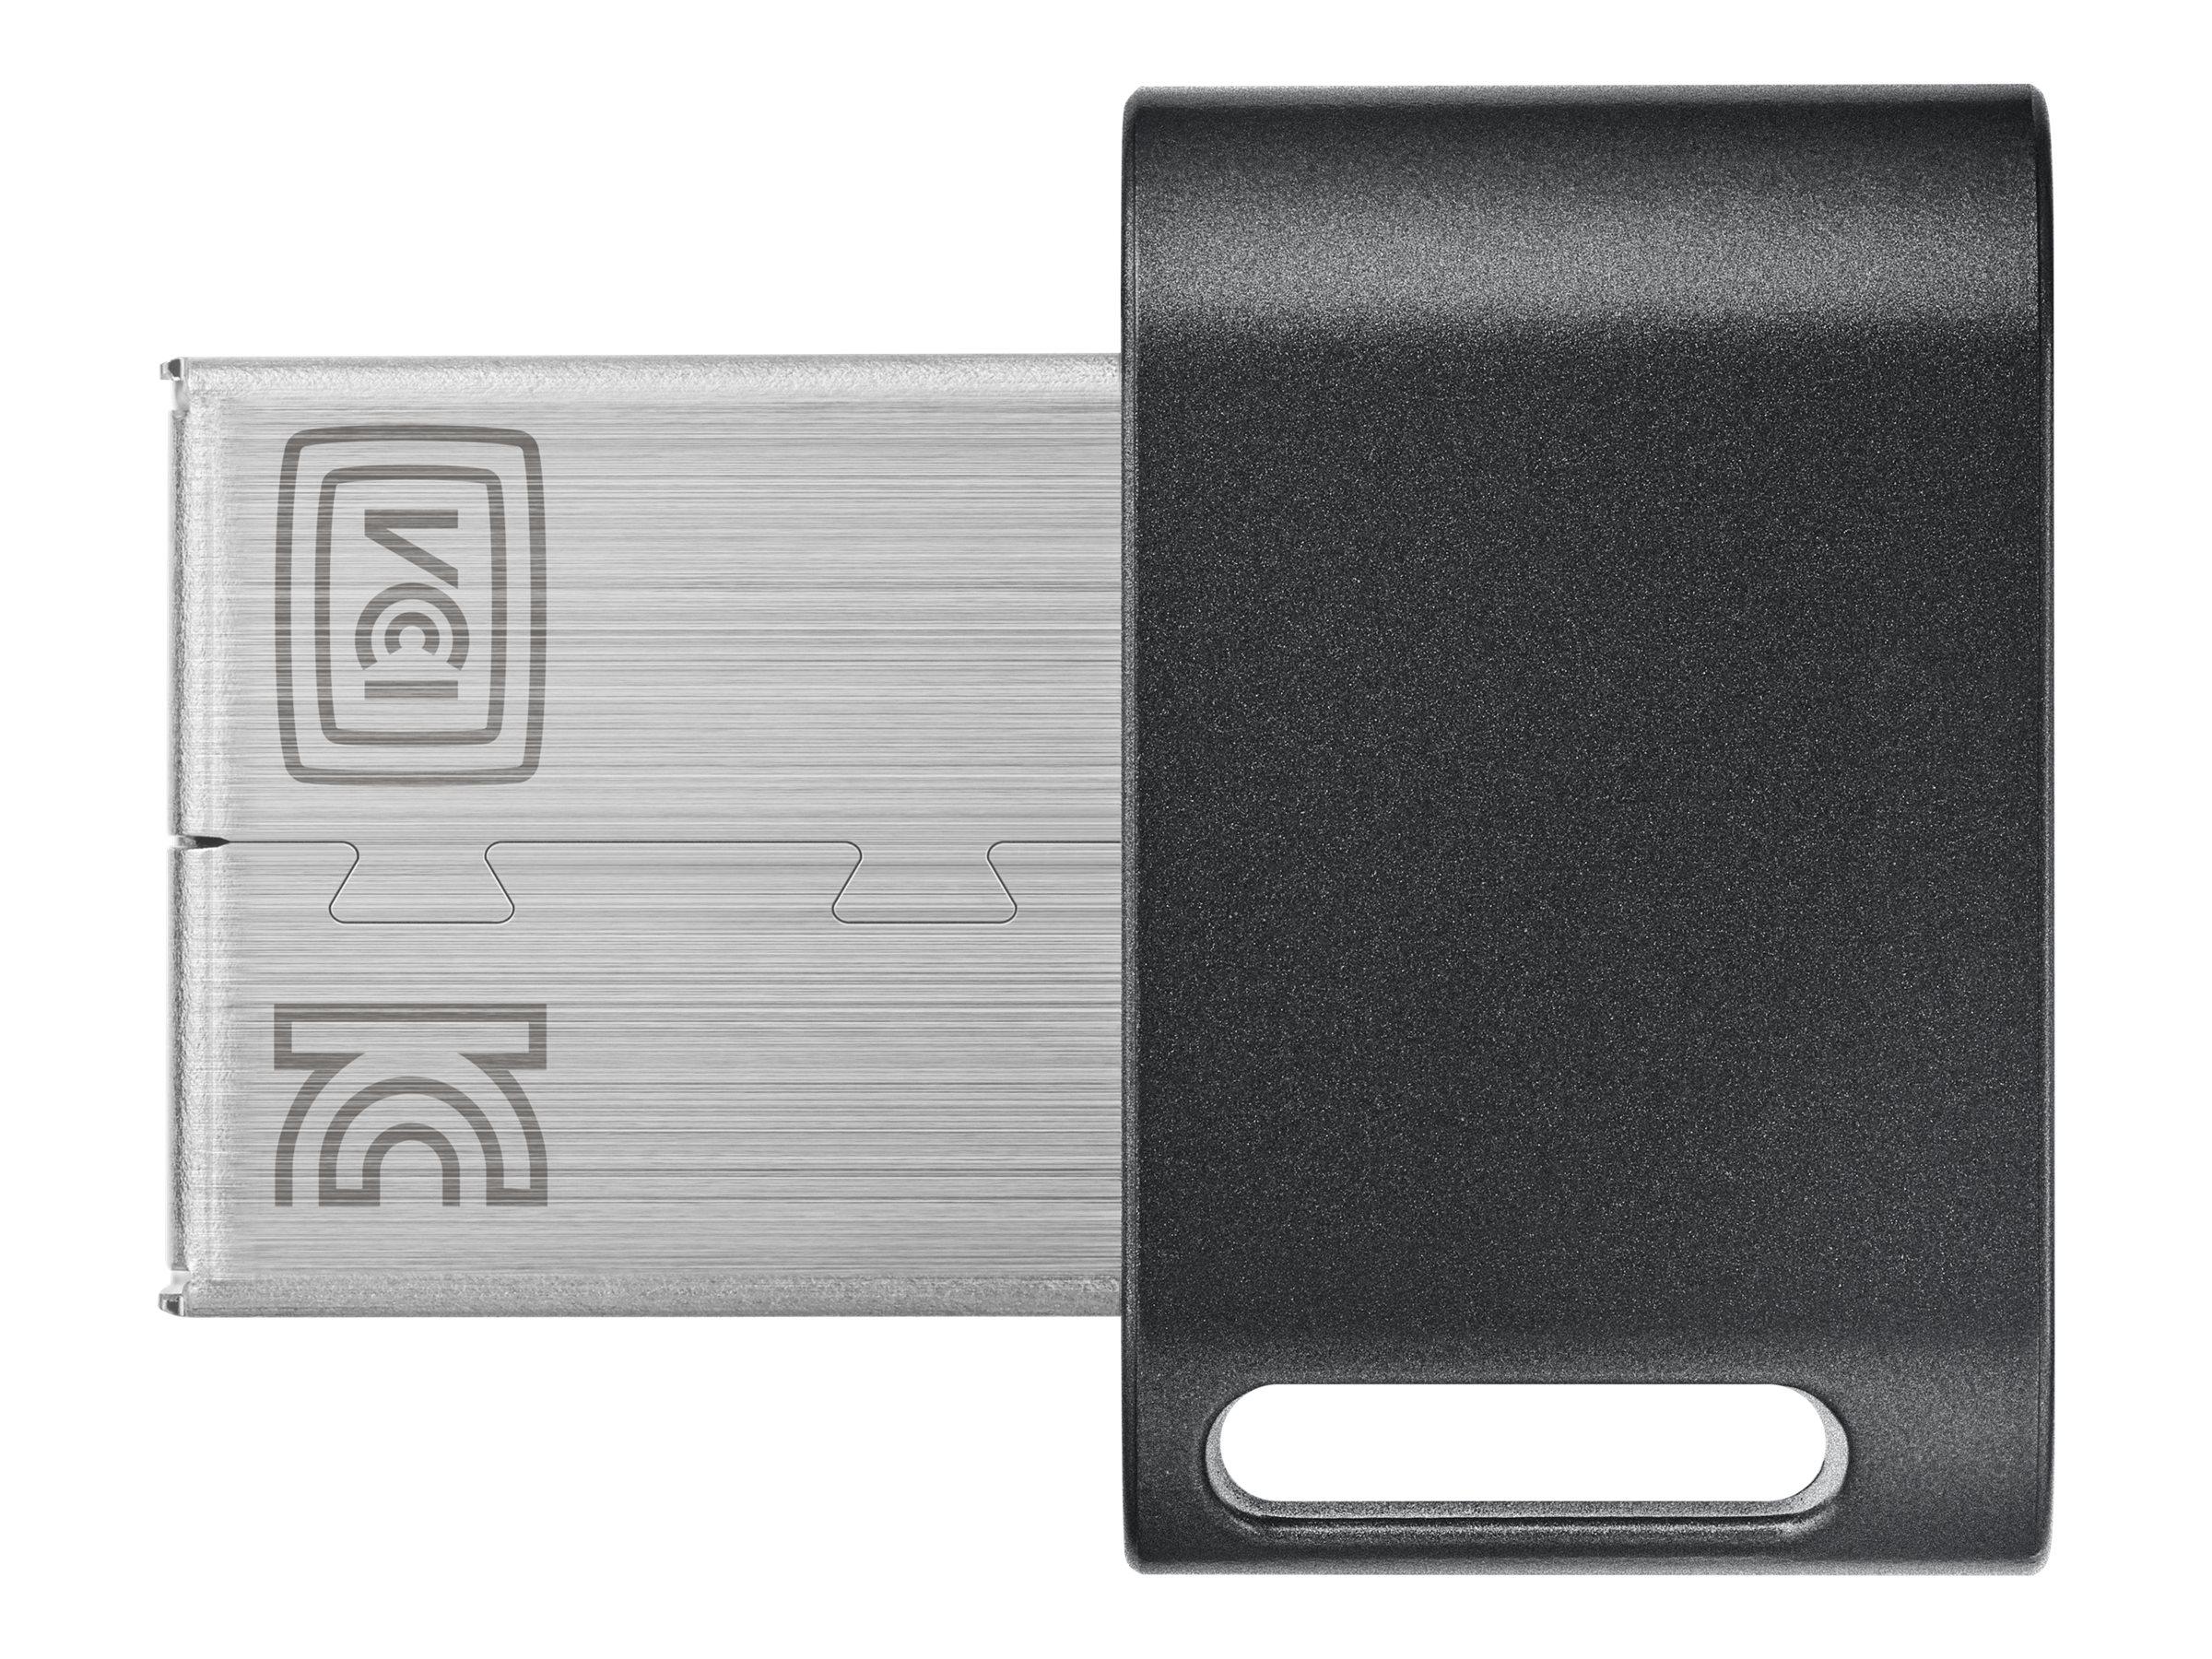 Samsung FIT Plus MUF-128AB - USB-Flash-Laufwerk